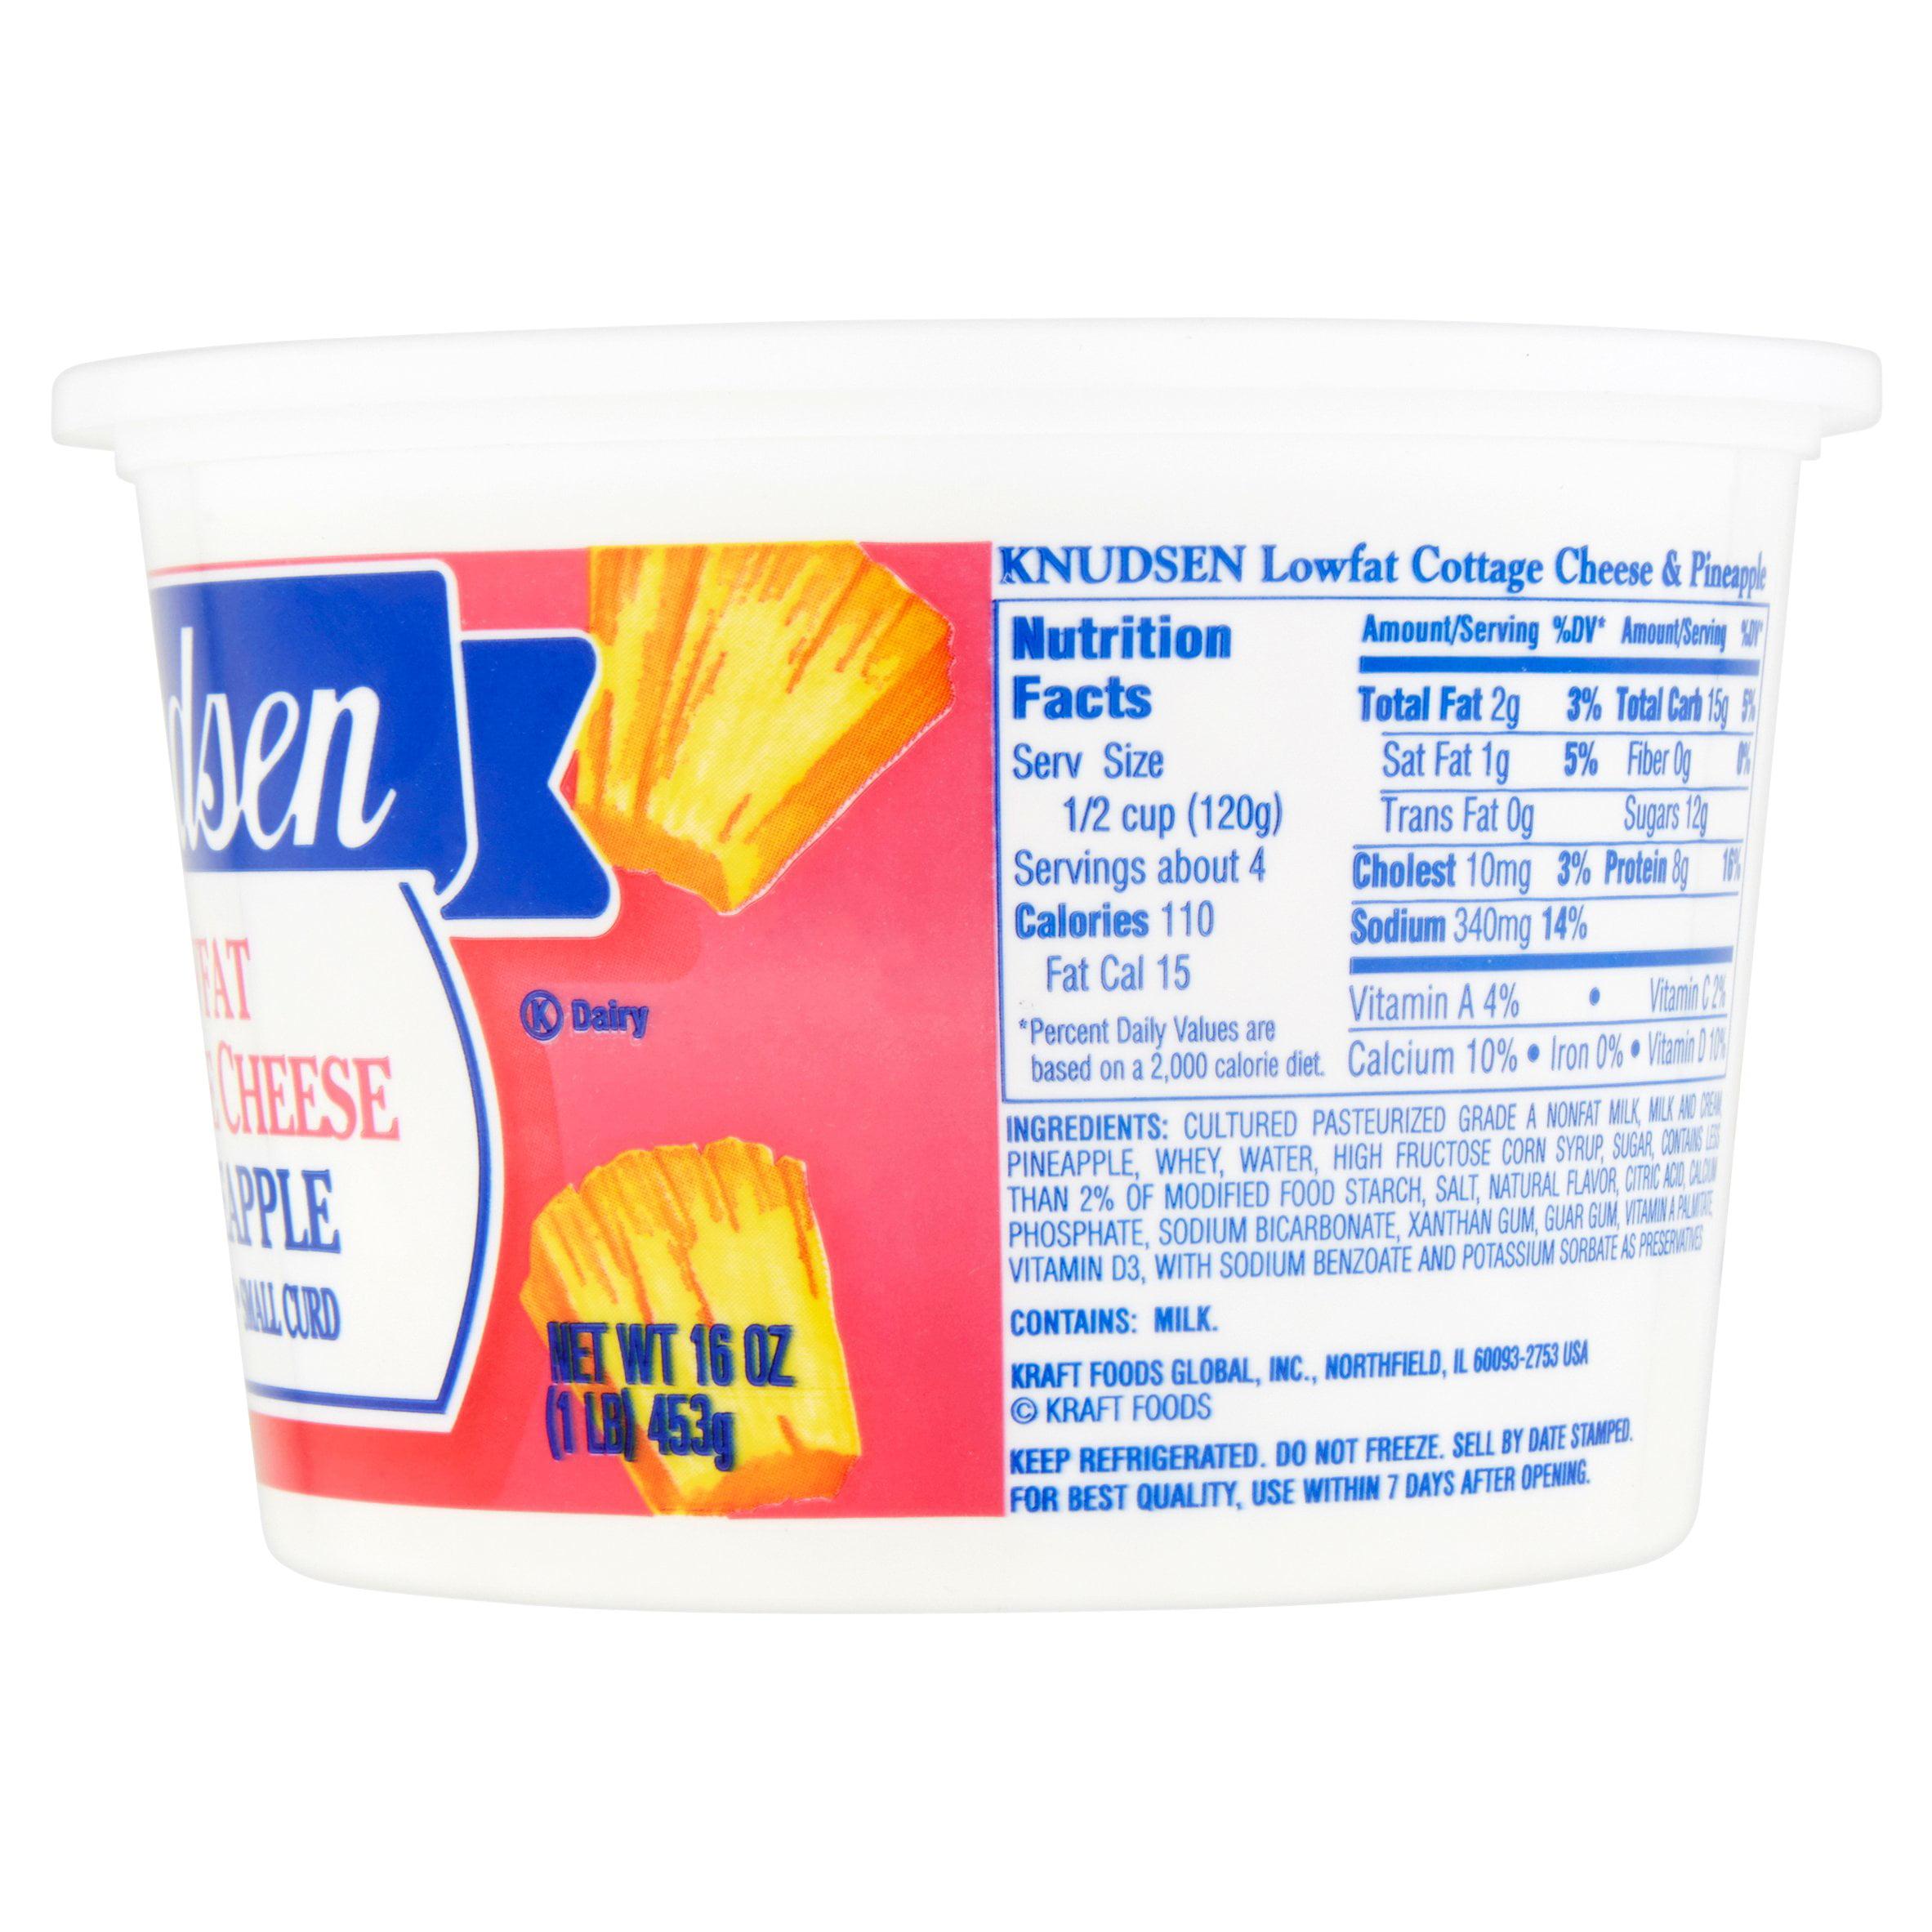 Knudsen Lowfat W/Pineapple Cottage Cheese, 16 Oz   Walmart.com